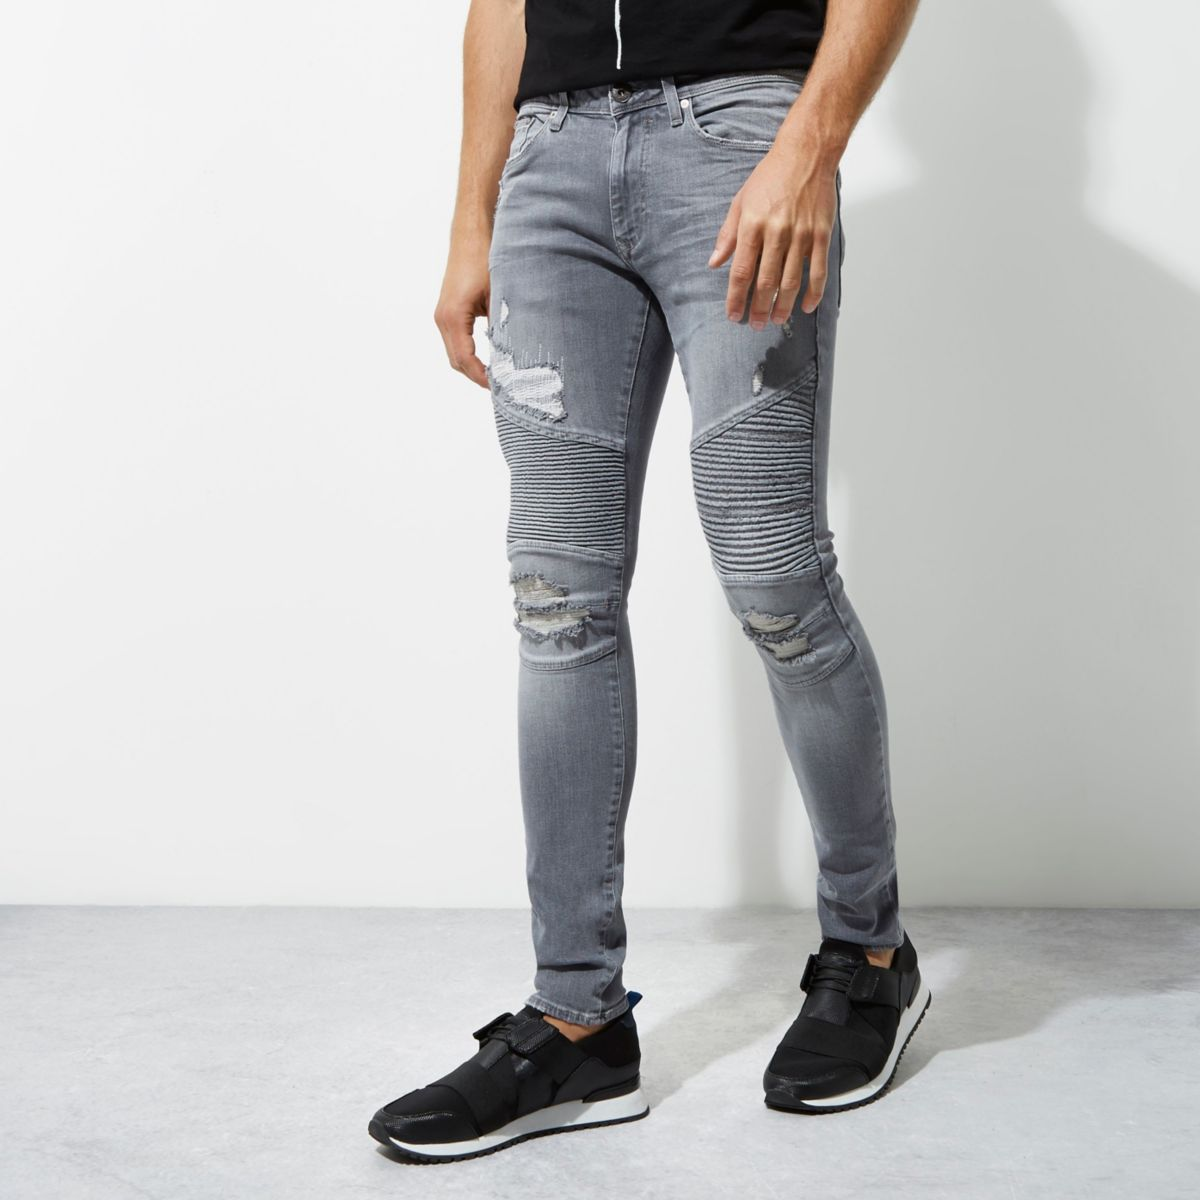 sid graue skinny biker jeans jeans sale herren. Black Bedroom Furniture Sets. Home Design Ideas